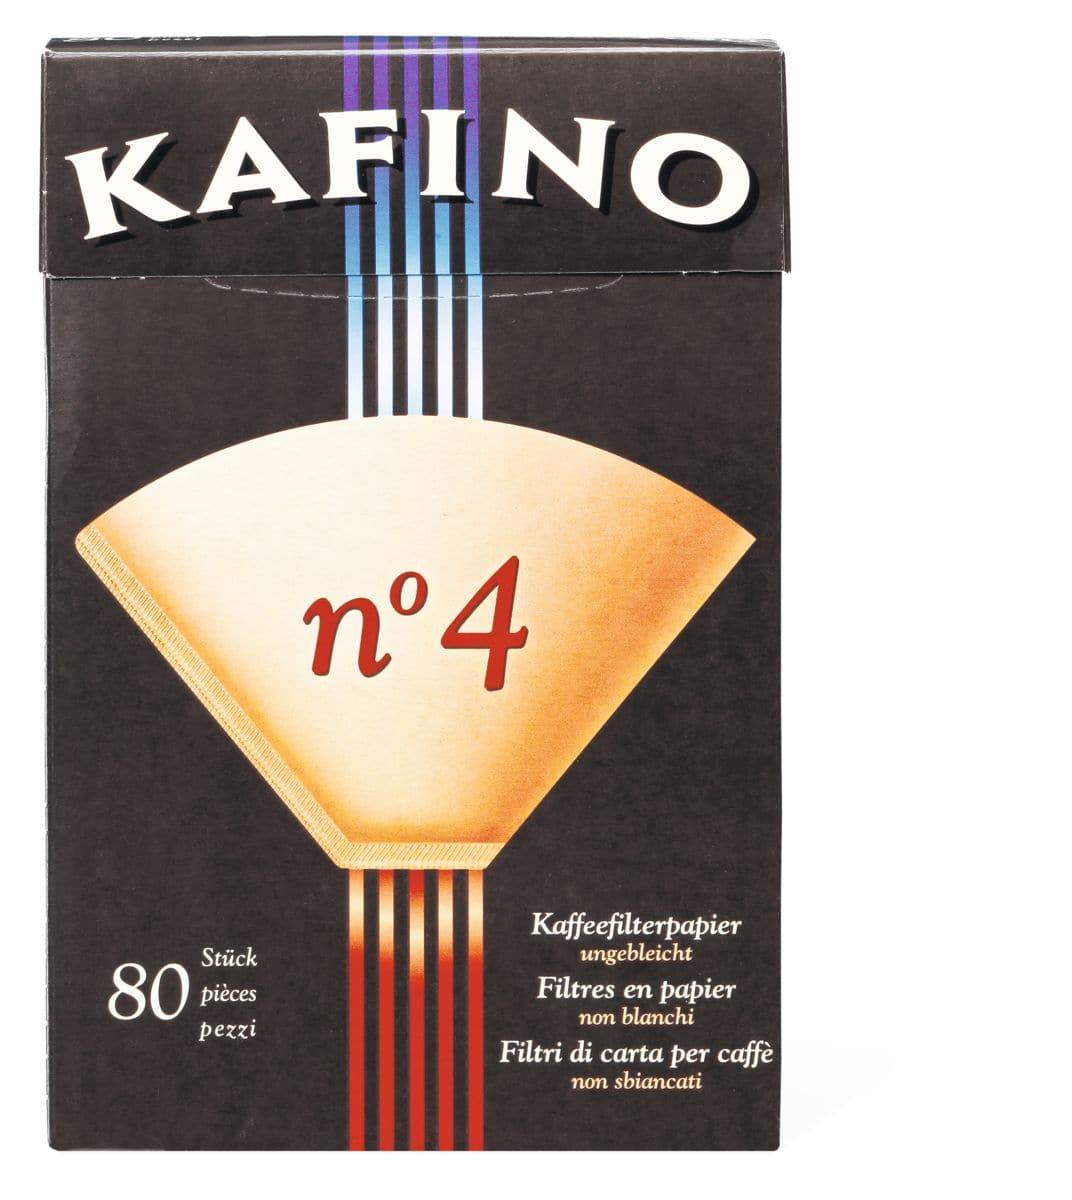 Kafino Kafino n°4 Kaffeefilterpapier